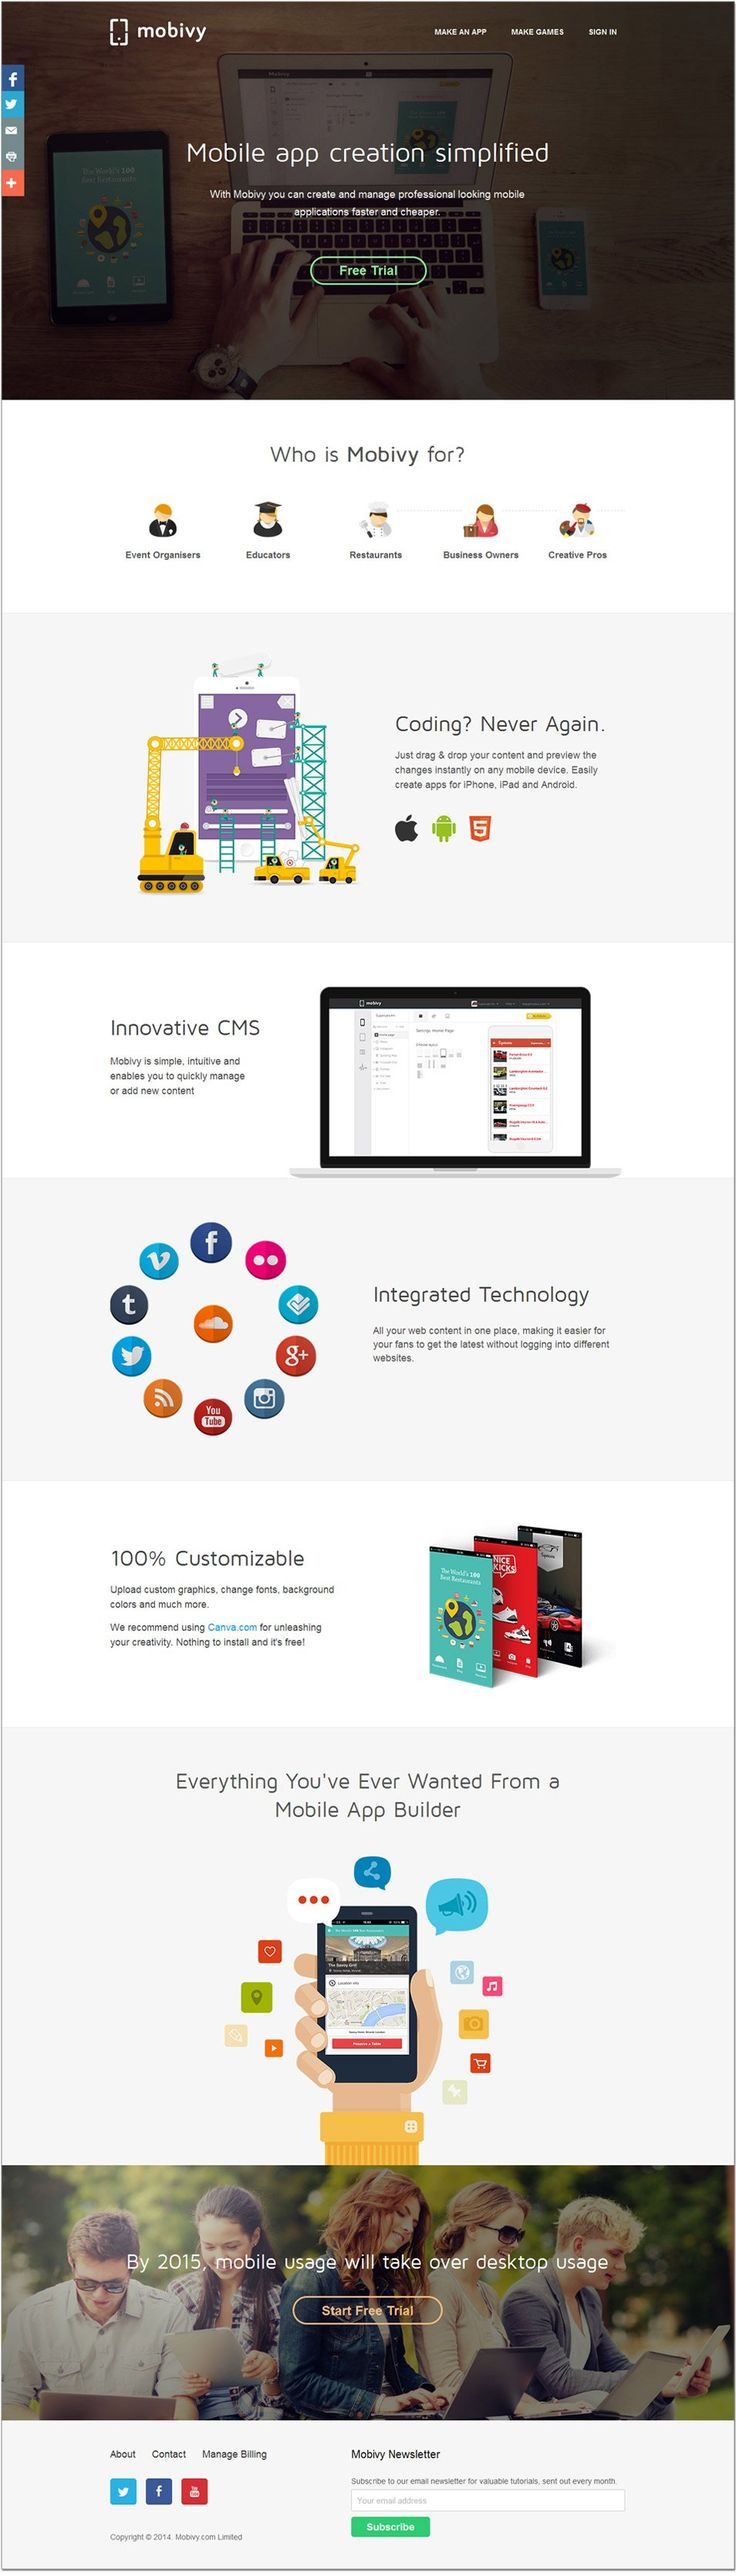 Unique Web Design, Mobivy #WebDesign #Design (http://www.pinterest.com/aldenchong/)